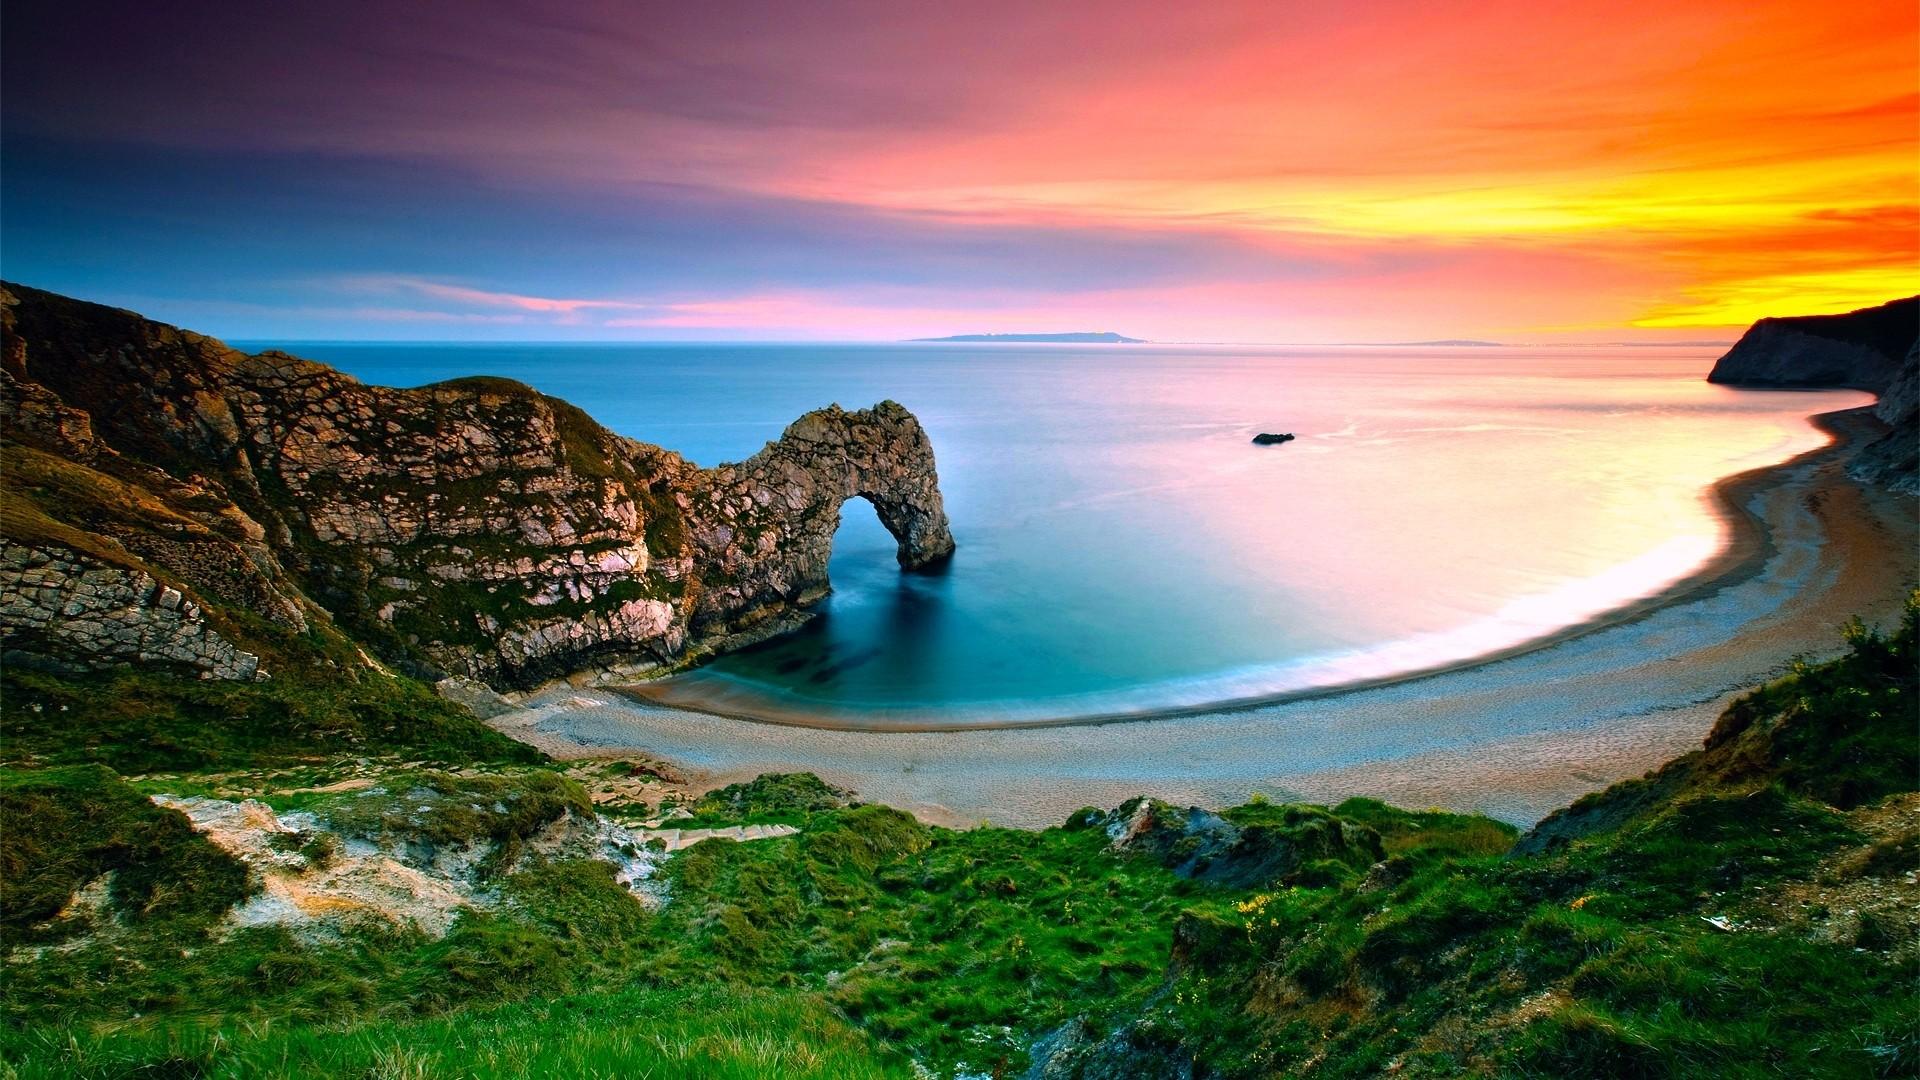 Landscap Wallpaper   … landscape ocean beach HD Desktop Wallpaper   HD Desktop  Wallpaper